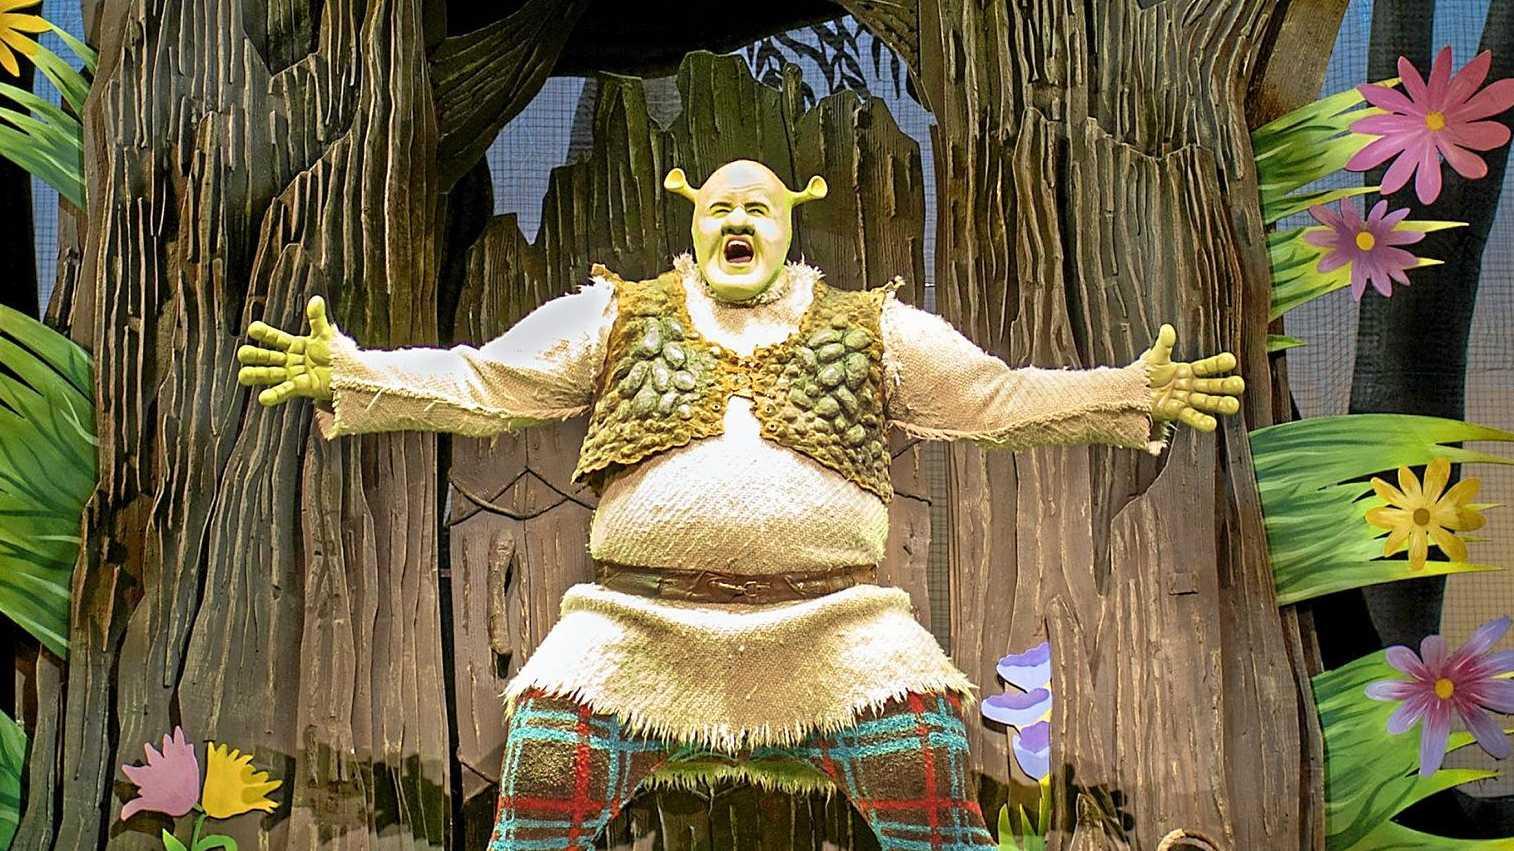 Shrek the Musical is coming to Australia.